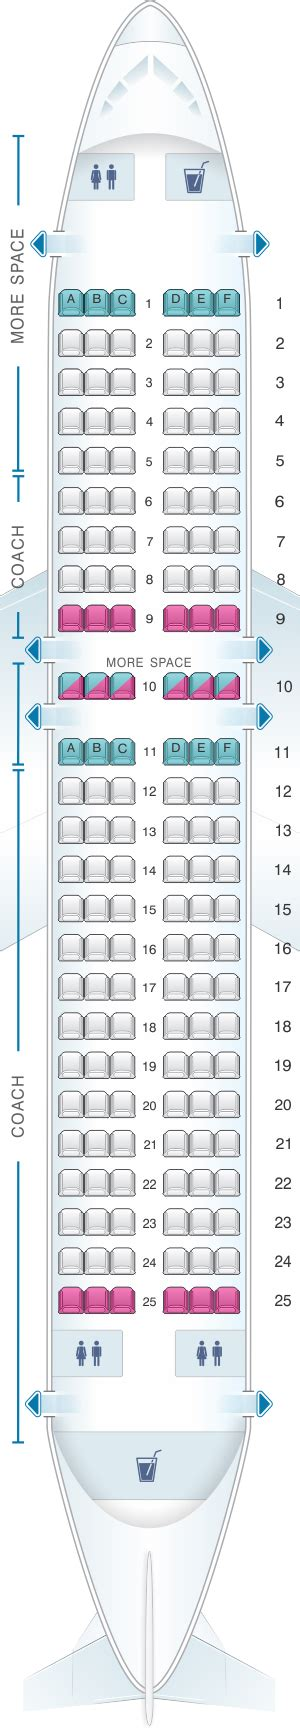 plan des sieges airbus a320 plan de cabine jetblue airways airbus a320 seatmaestro fr